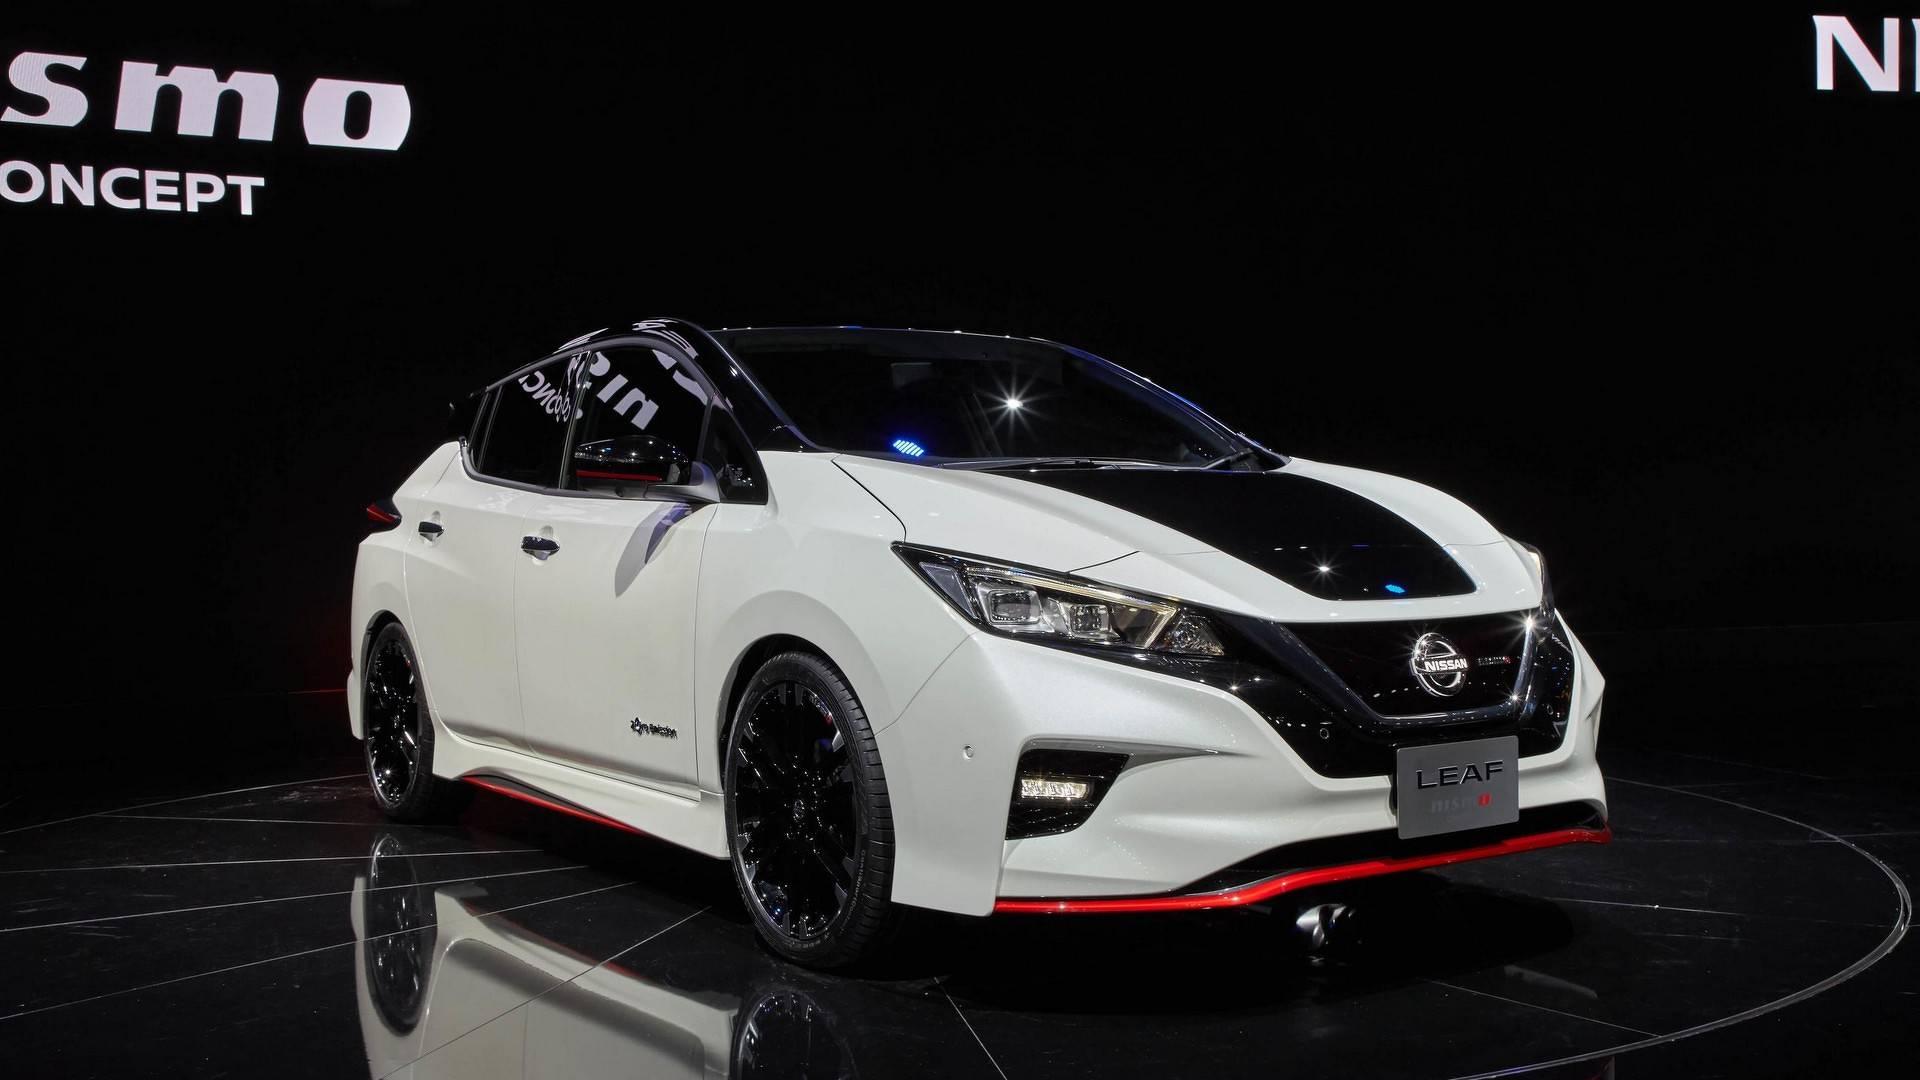 Aggressive-Looking Nissan Leaf Nismo Concept Debuts In Tokyo